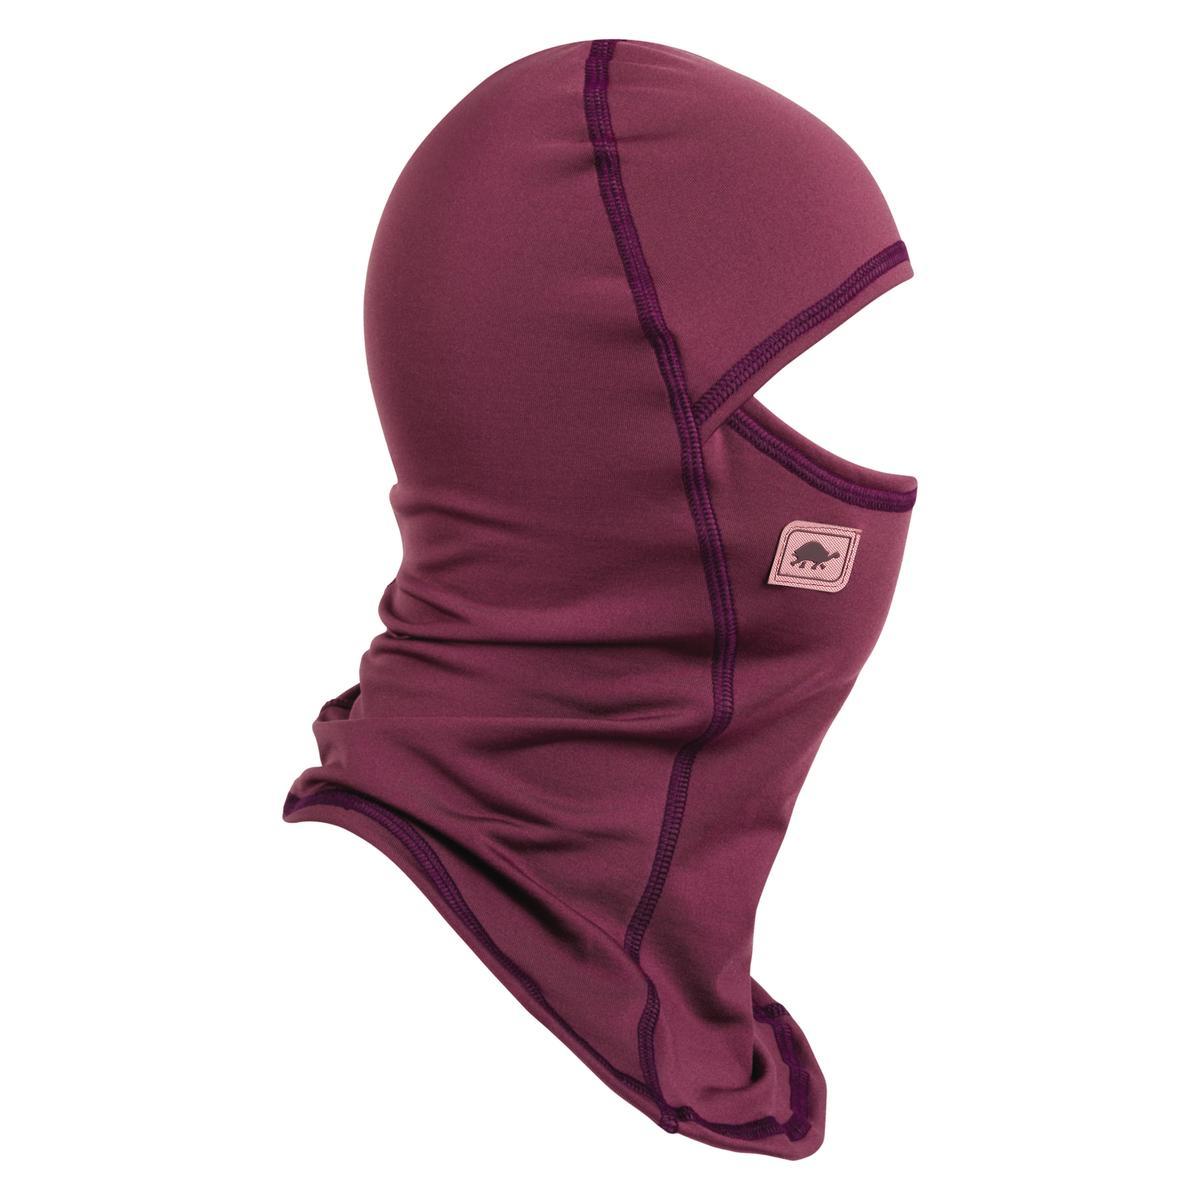 Turtle Fur Comfort Shell Ninja Balaclava Winter Berry - One Size